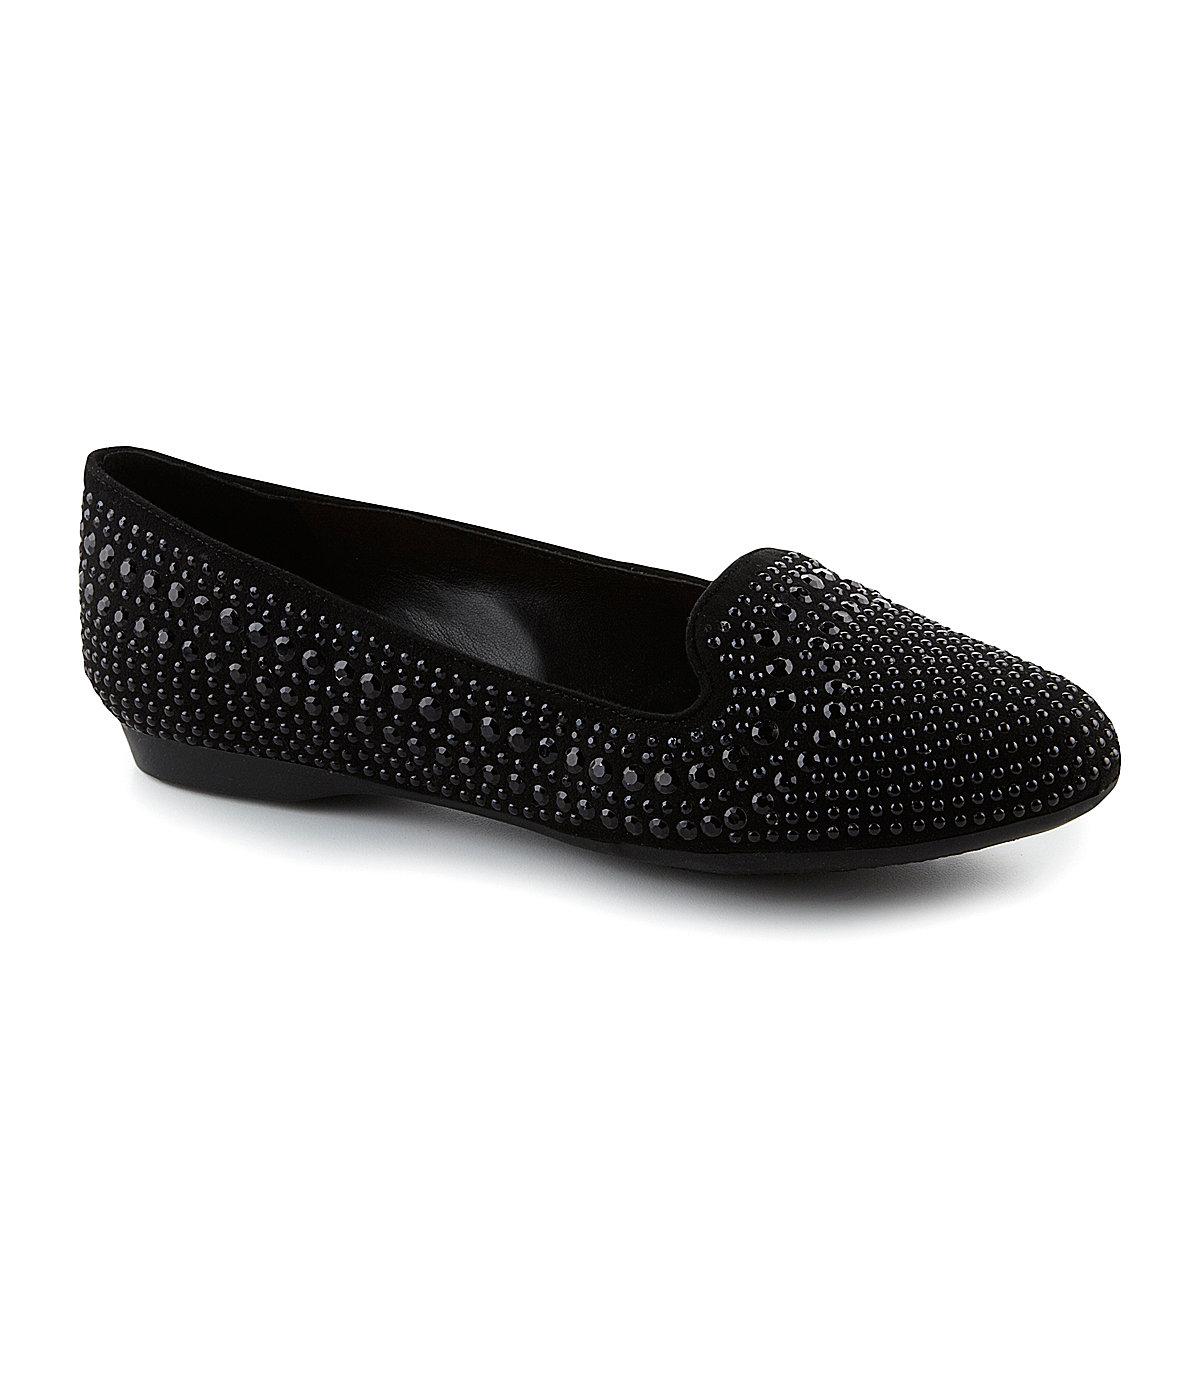 Gianni Bini Richee Smoking Slippers ($80)